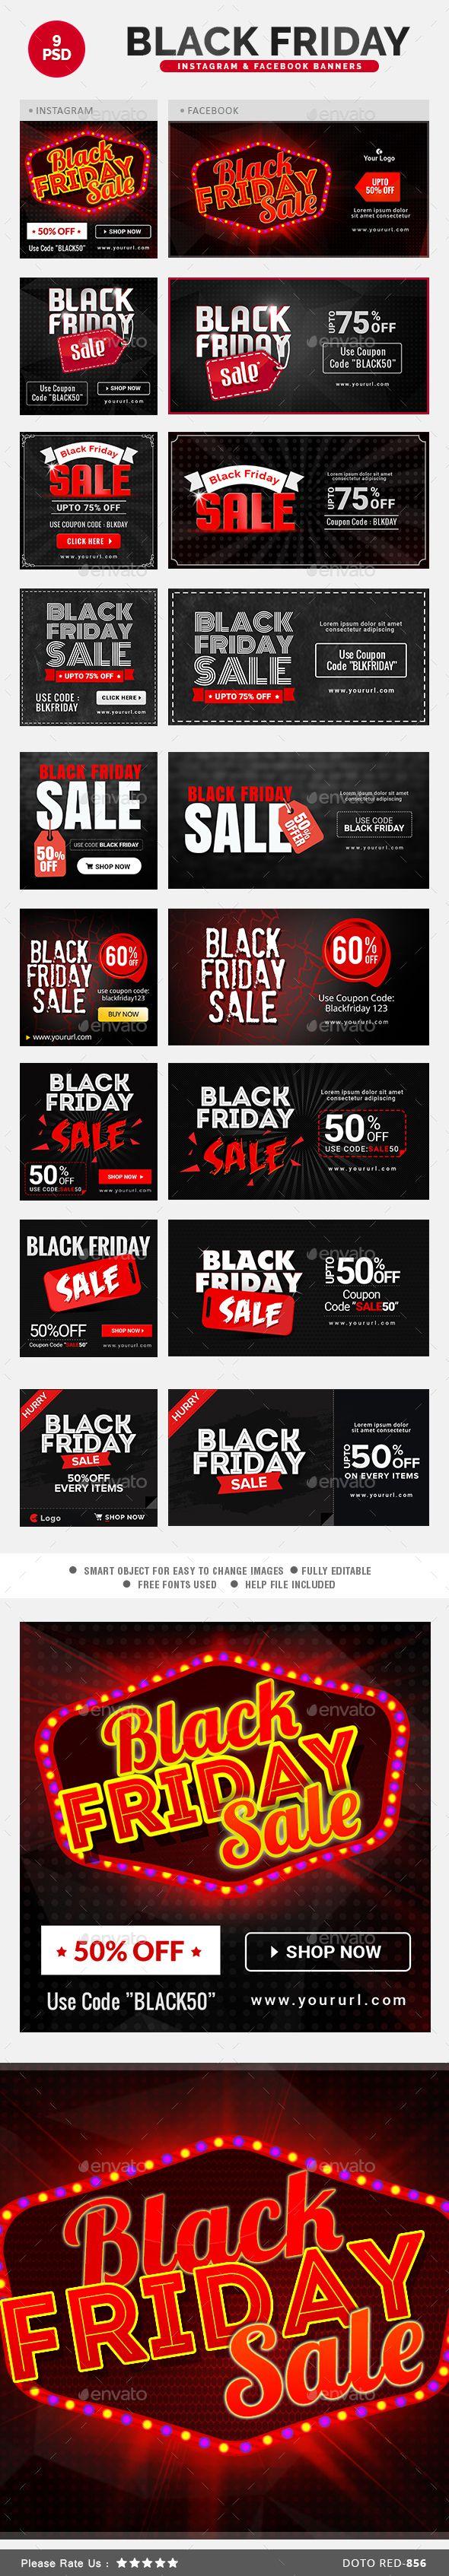 Black Friday Sales Instagram & Facebook Banners Template PSD #design Download: http://graphicriver.net/item/black-friday-sales-instagram-facebook-banners/13695866?ref=ksioks